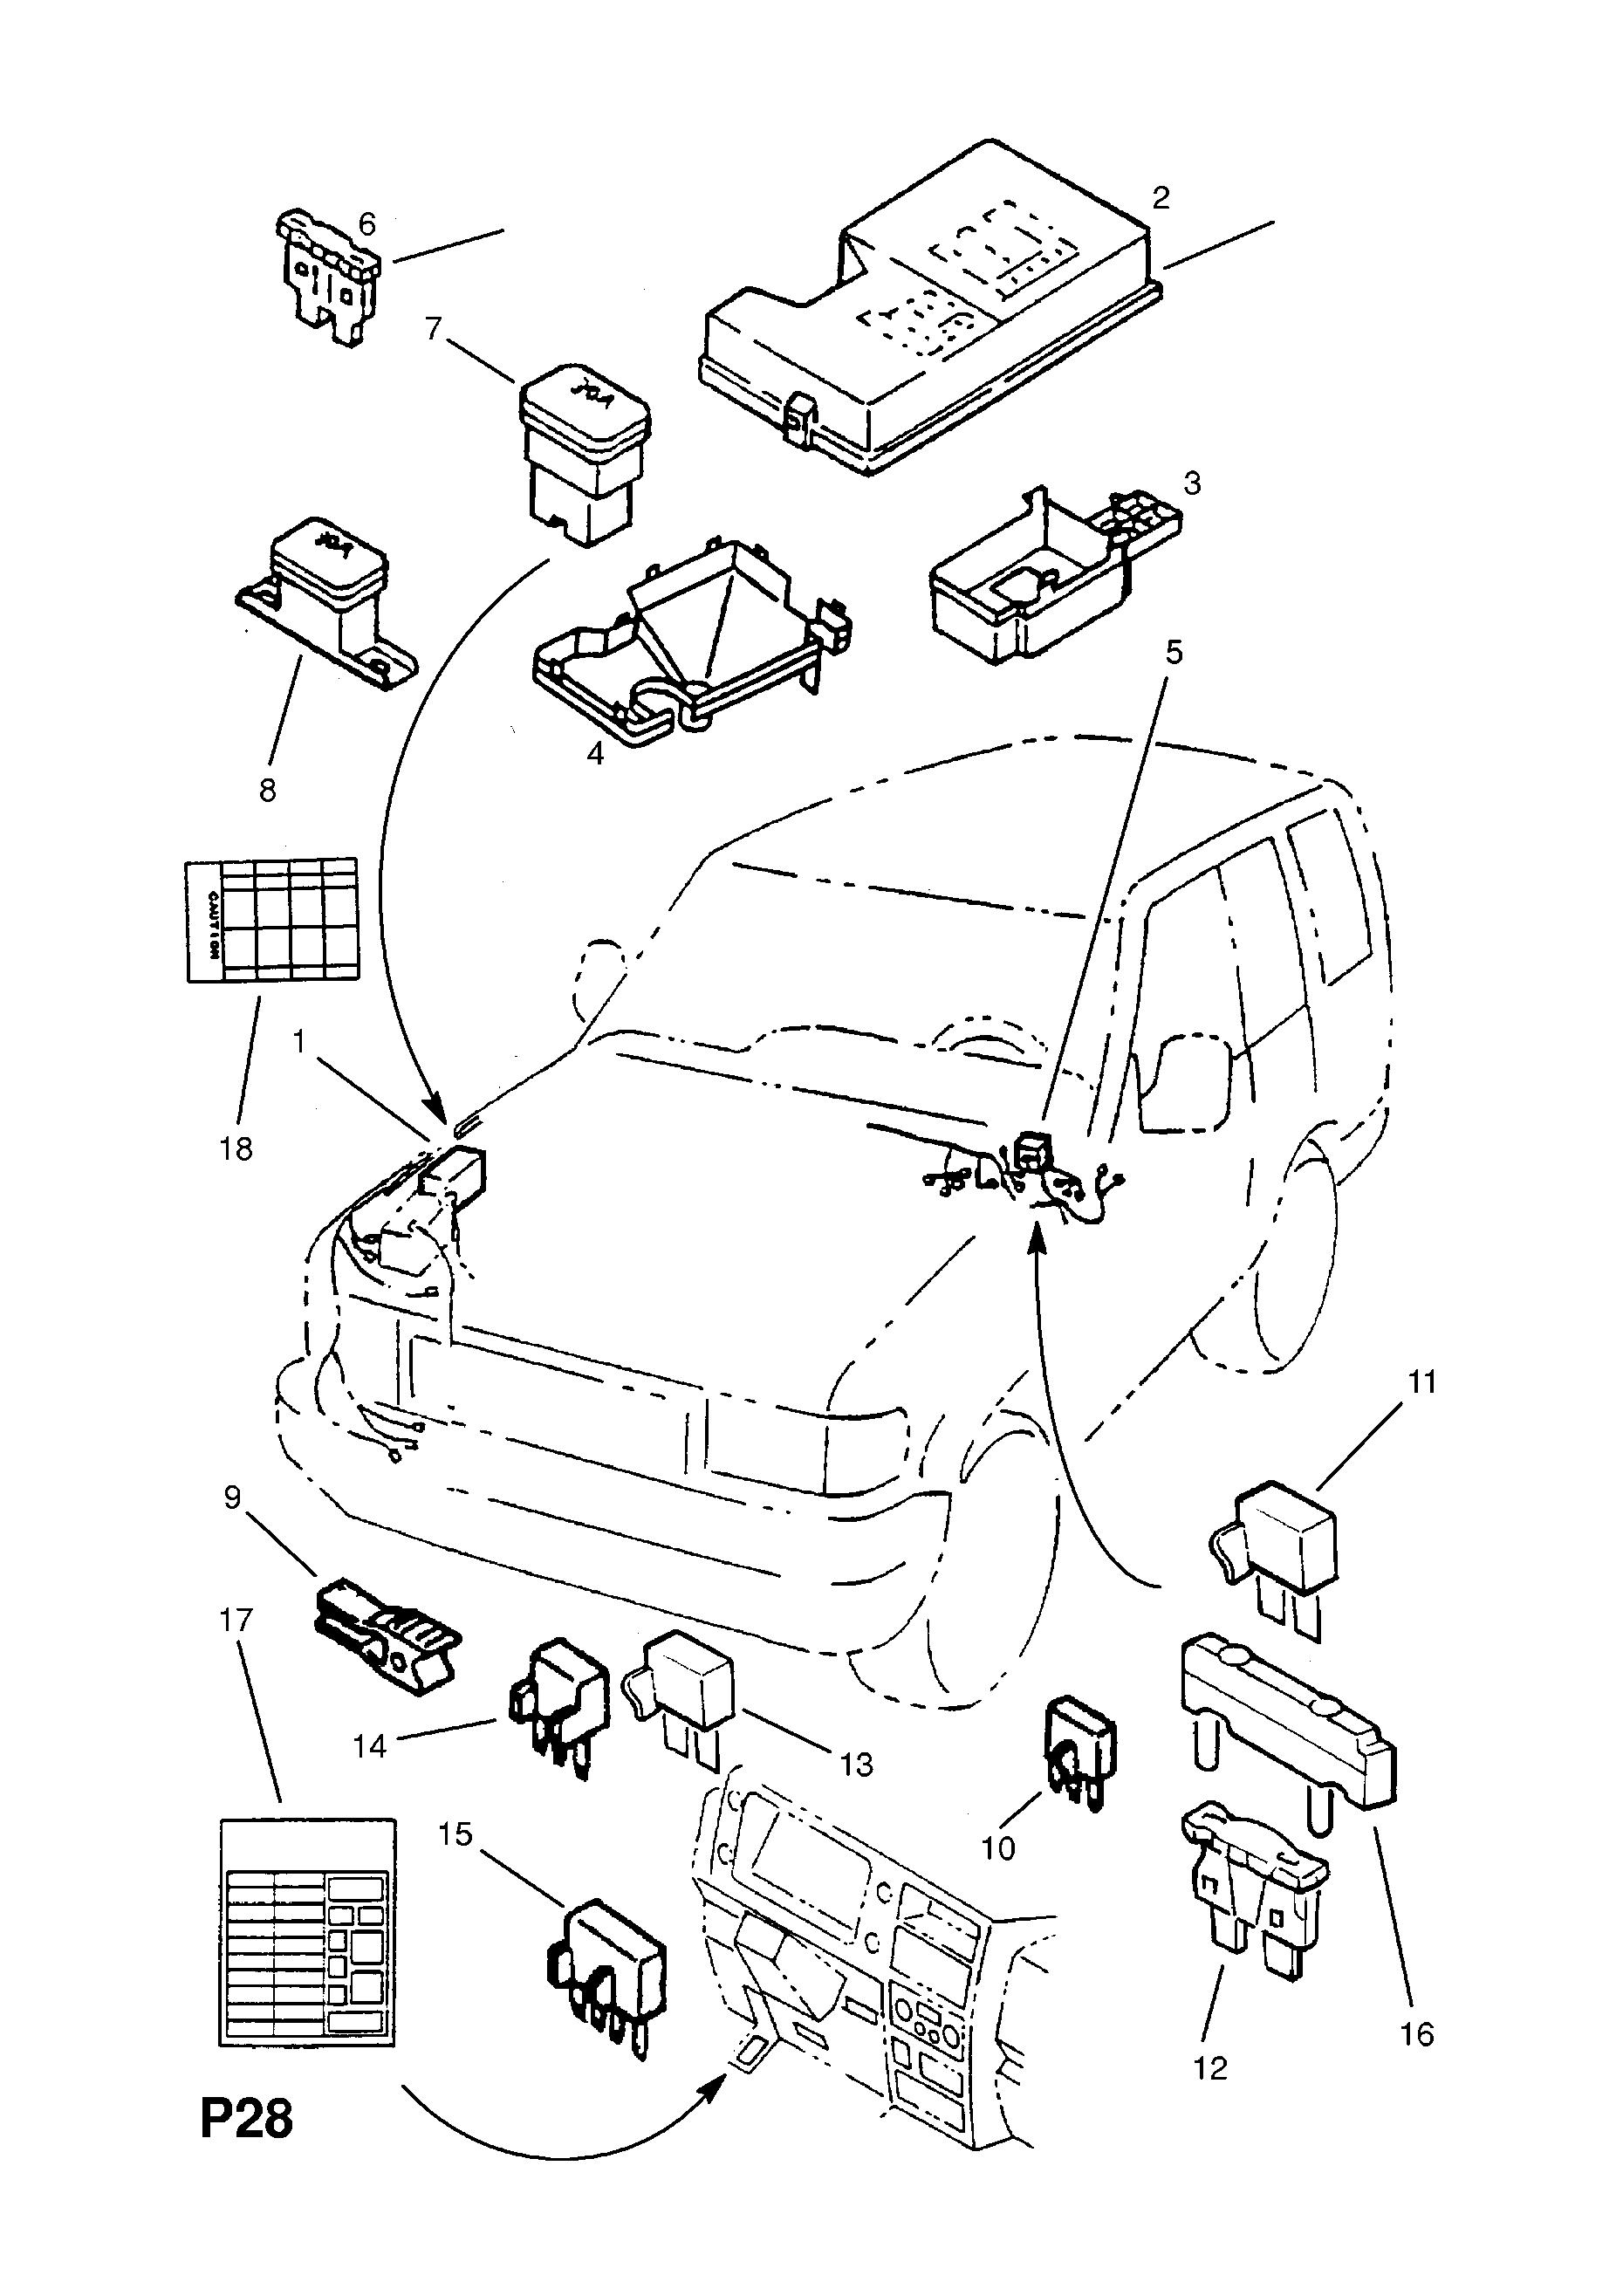 Vauxhall MONTEREY / Spare parts catalog EPC